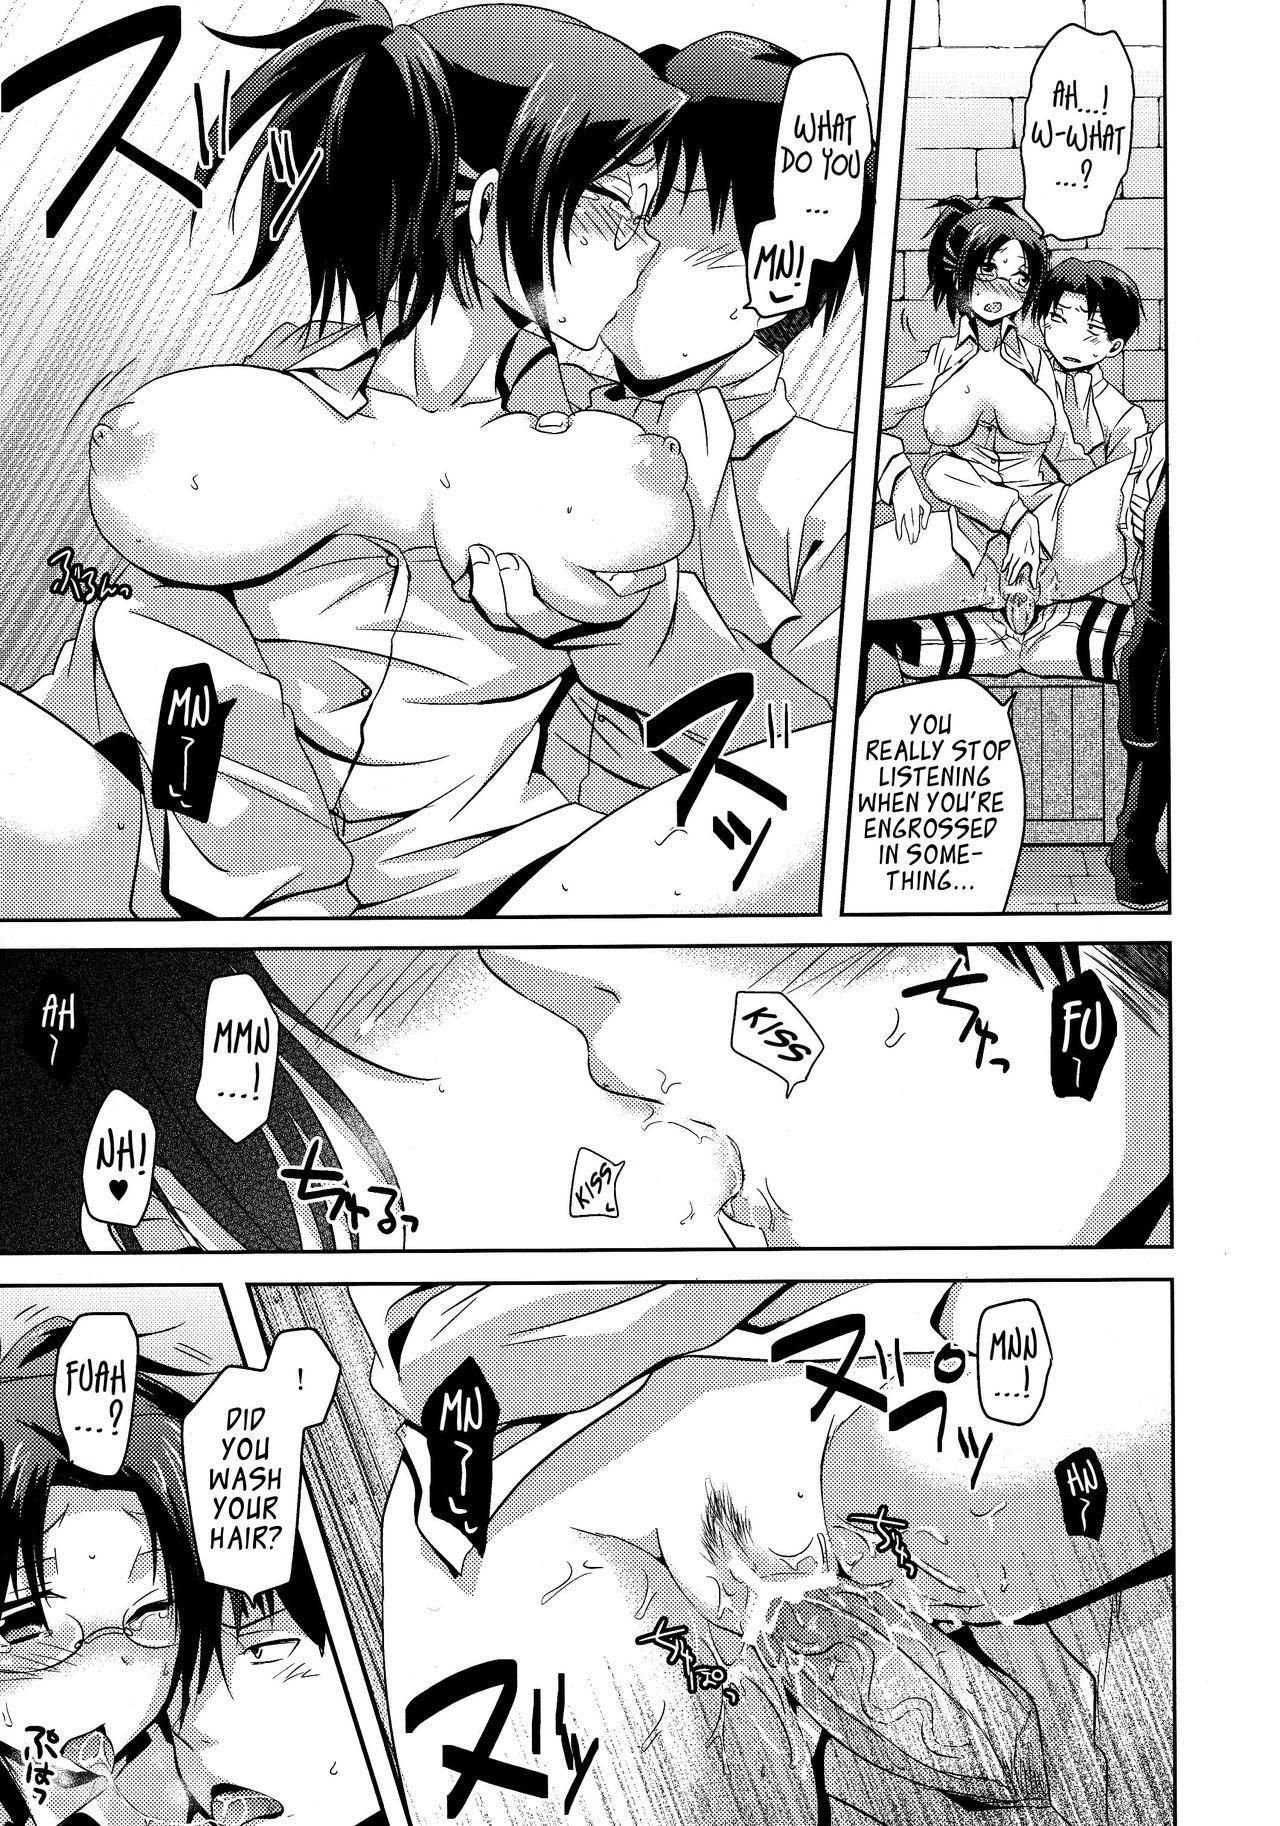 Shikkari shite kudasai Buntaichou. | Please take this seriously, Squad Leader. 20